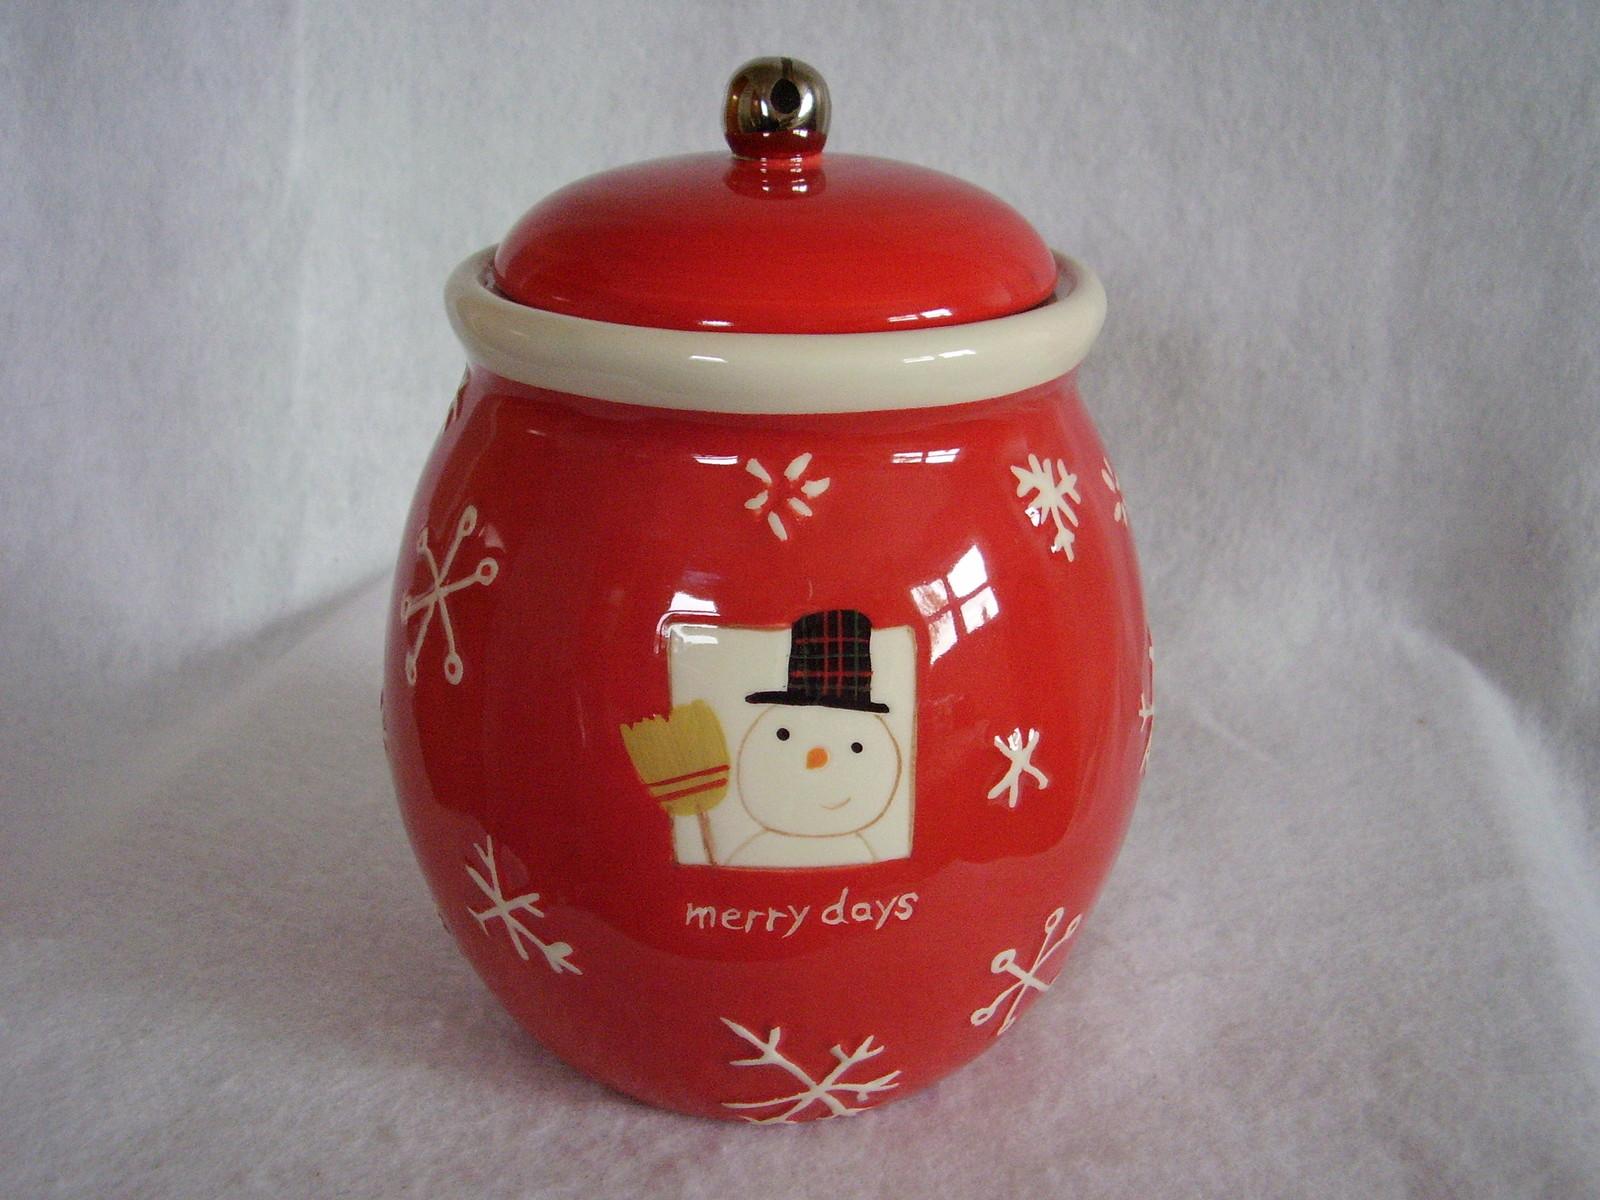 Hallmark Christmas Cookie Treat Jar Merry Days Snowman Snowflakes Jingle Bell